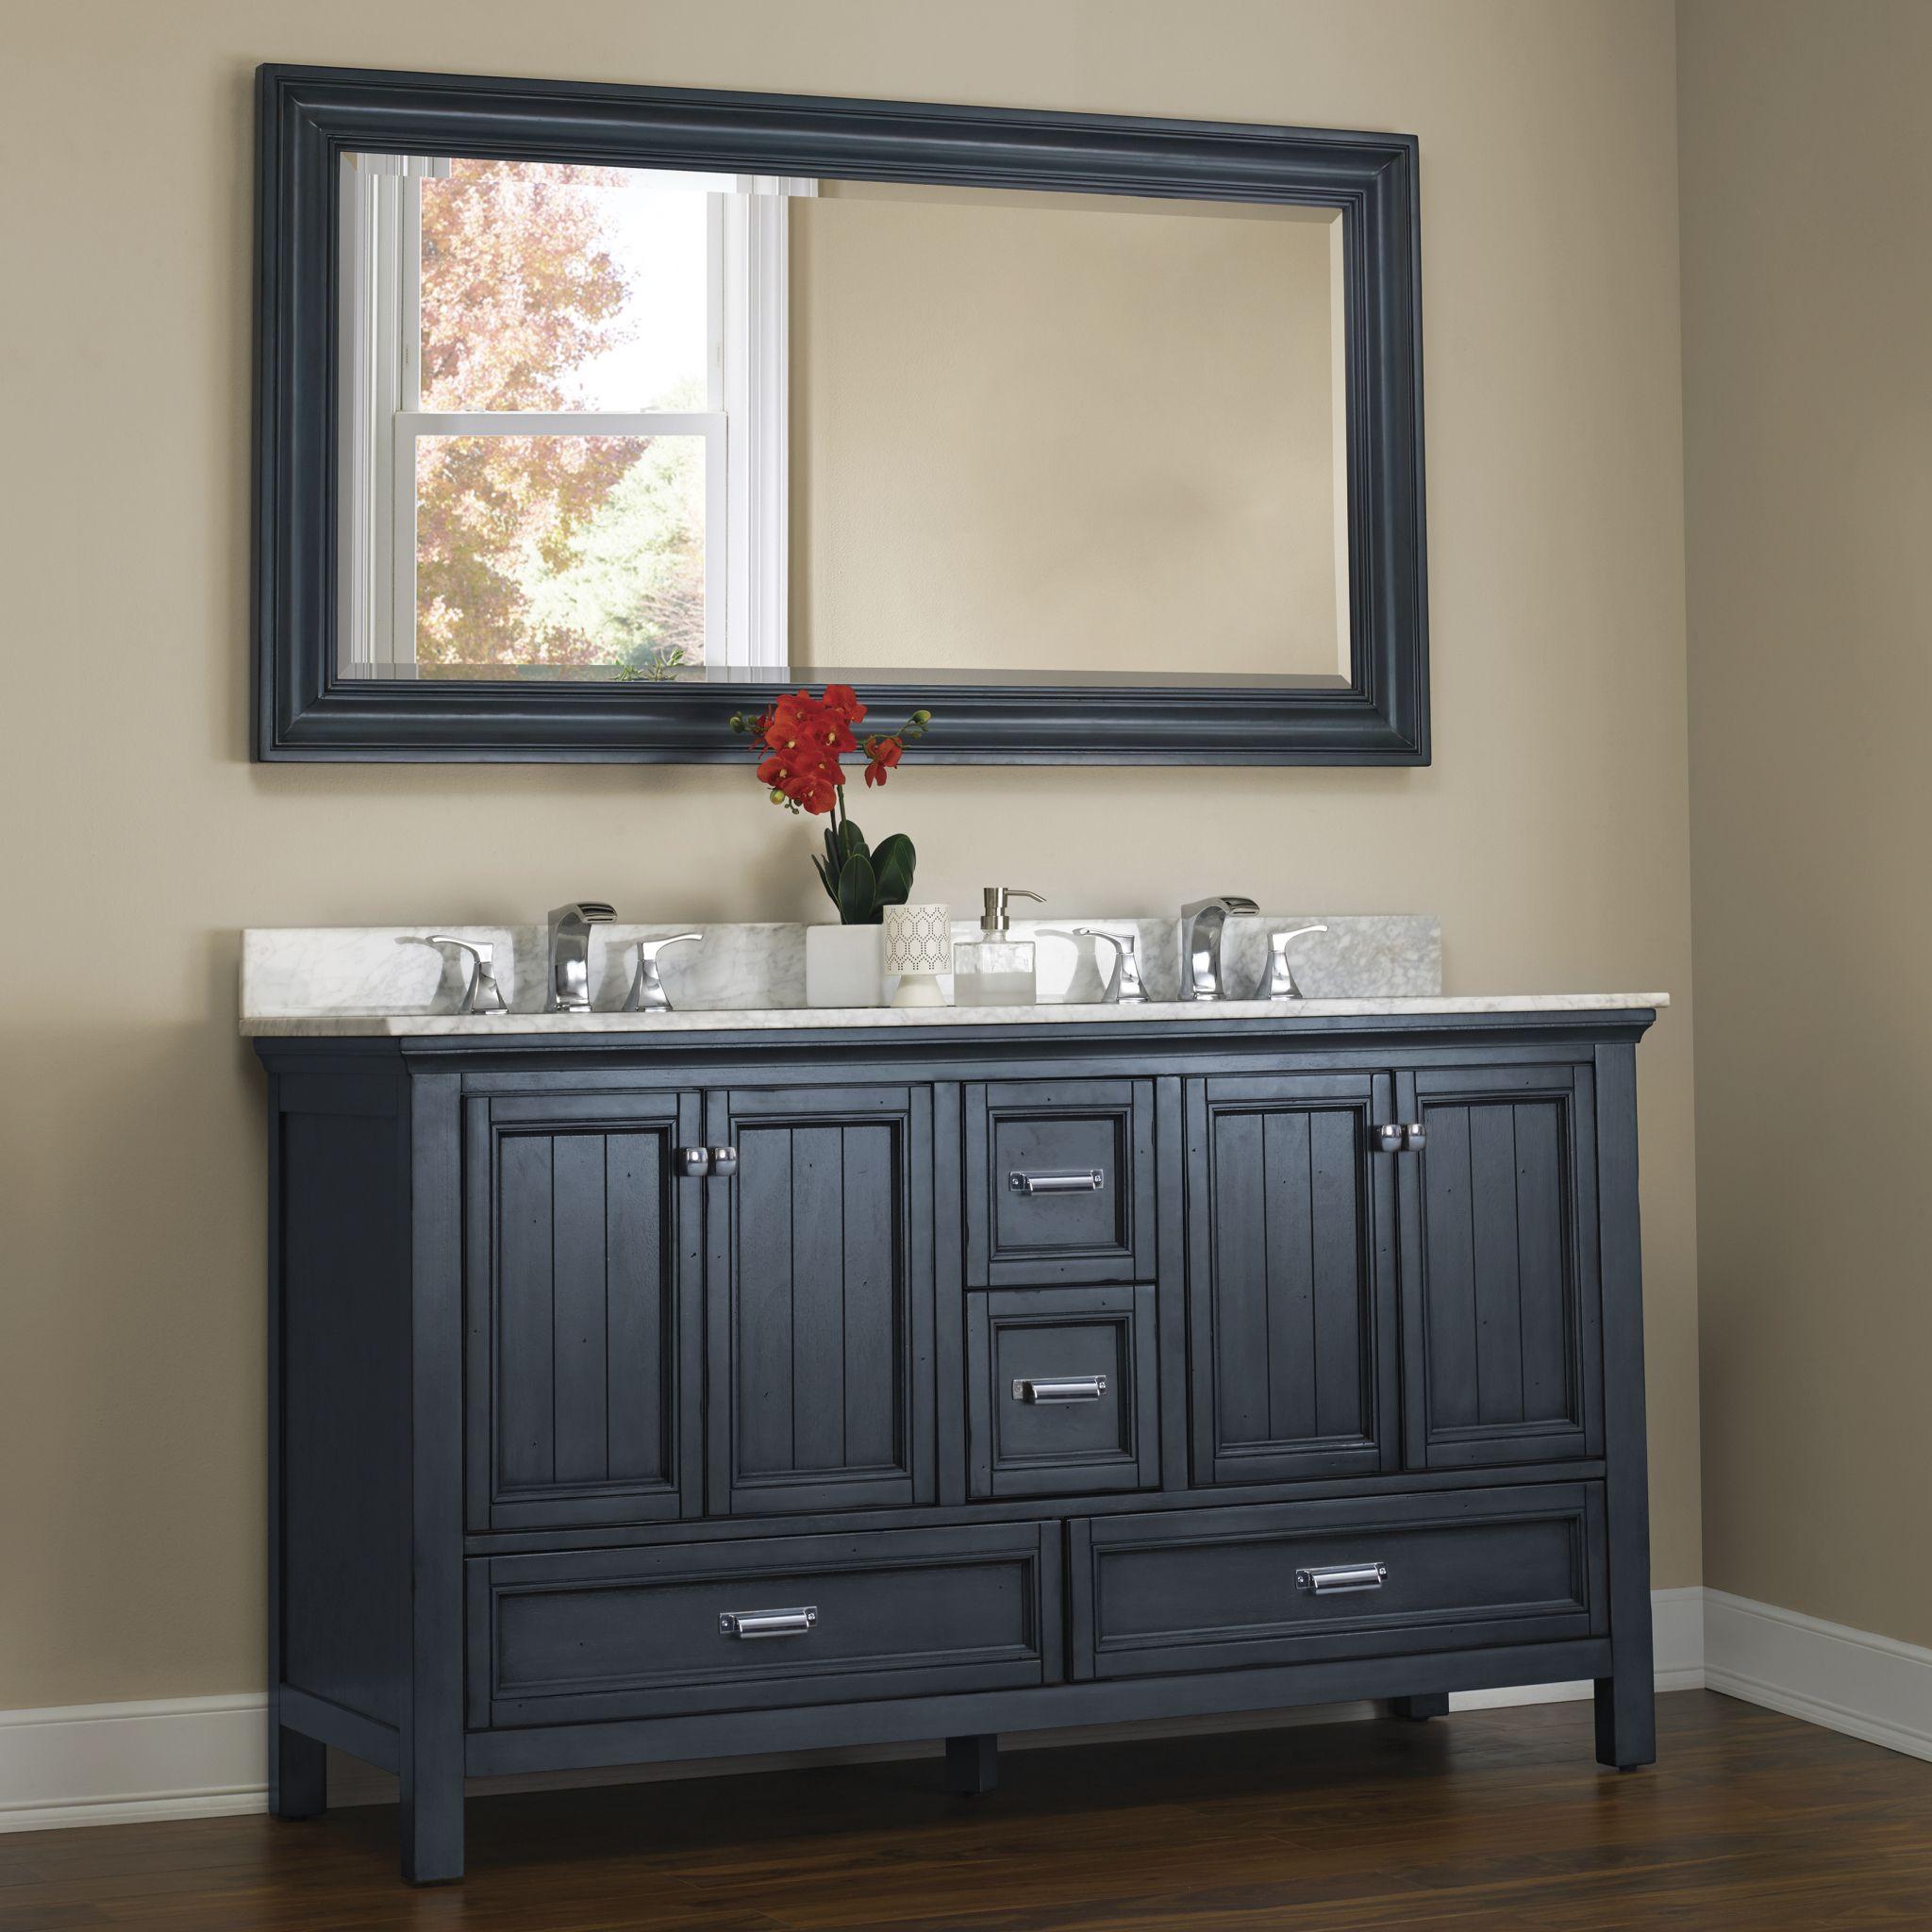 Foremost Babv6022d Blue Bathroom Vanity Floating Bathroom